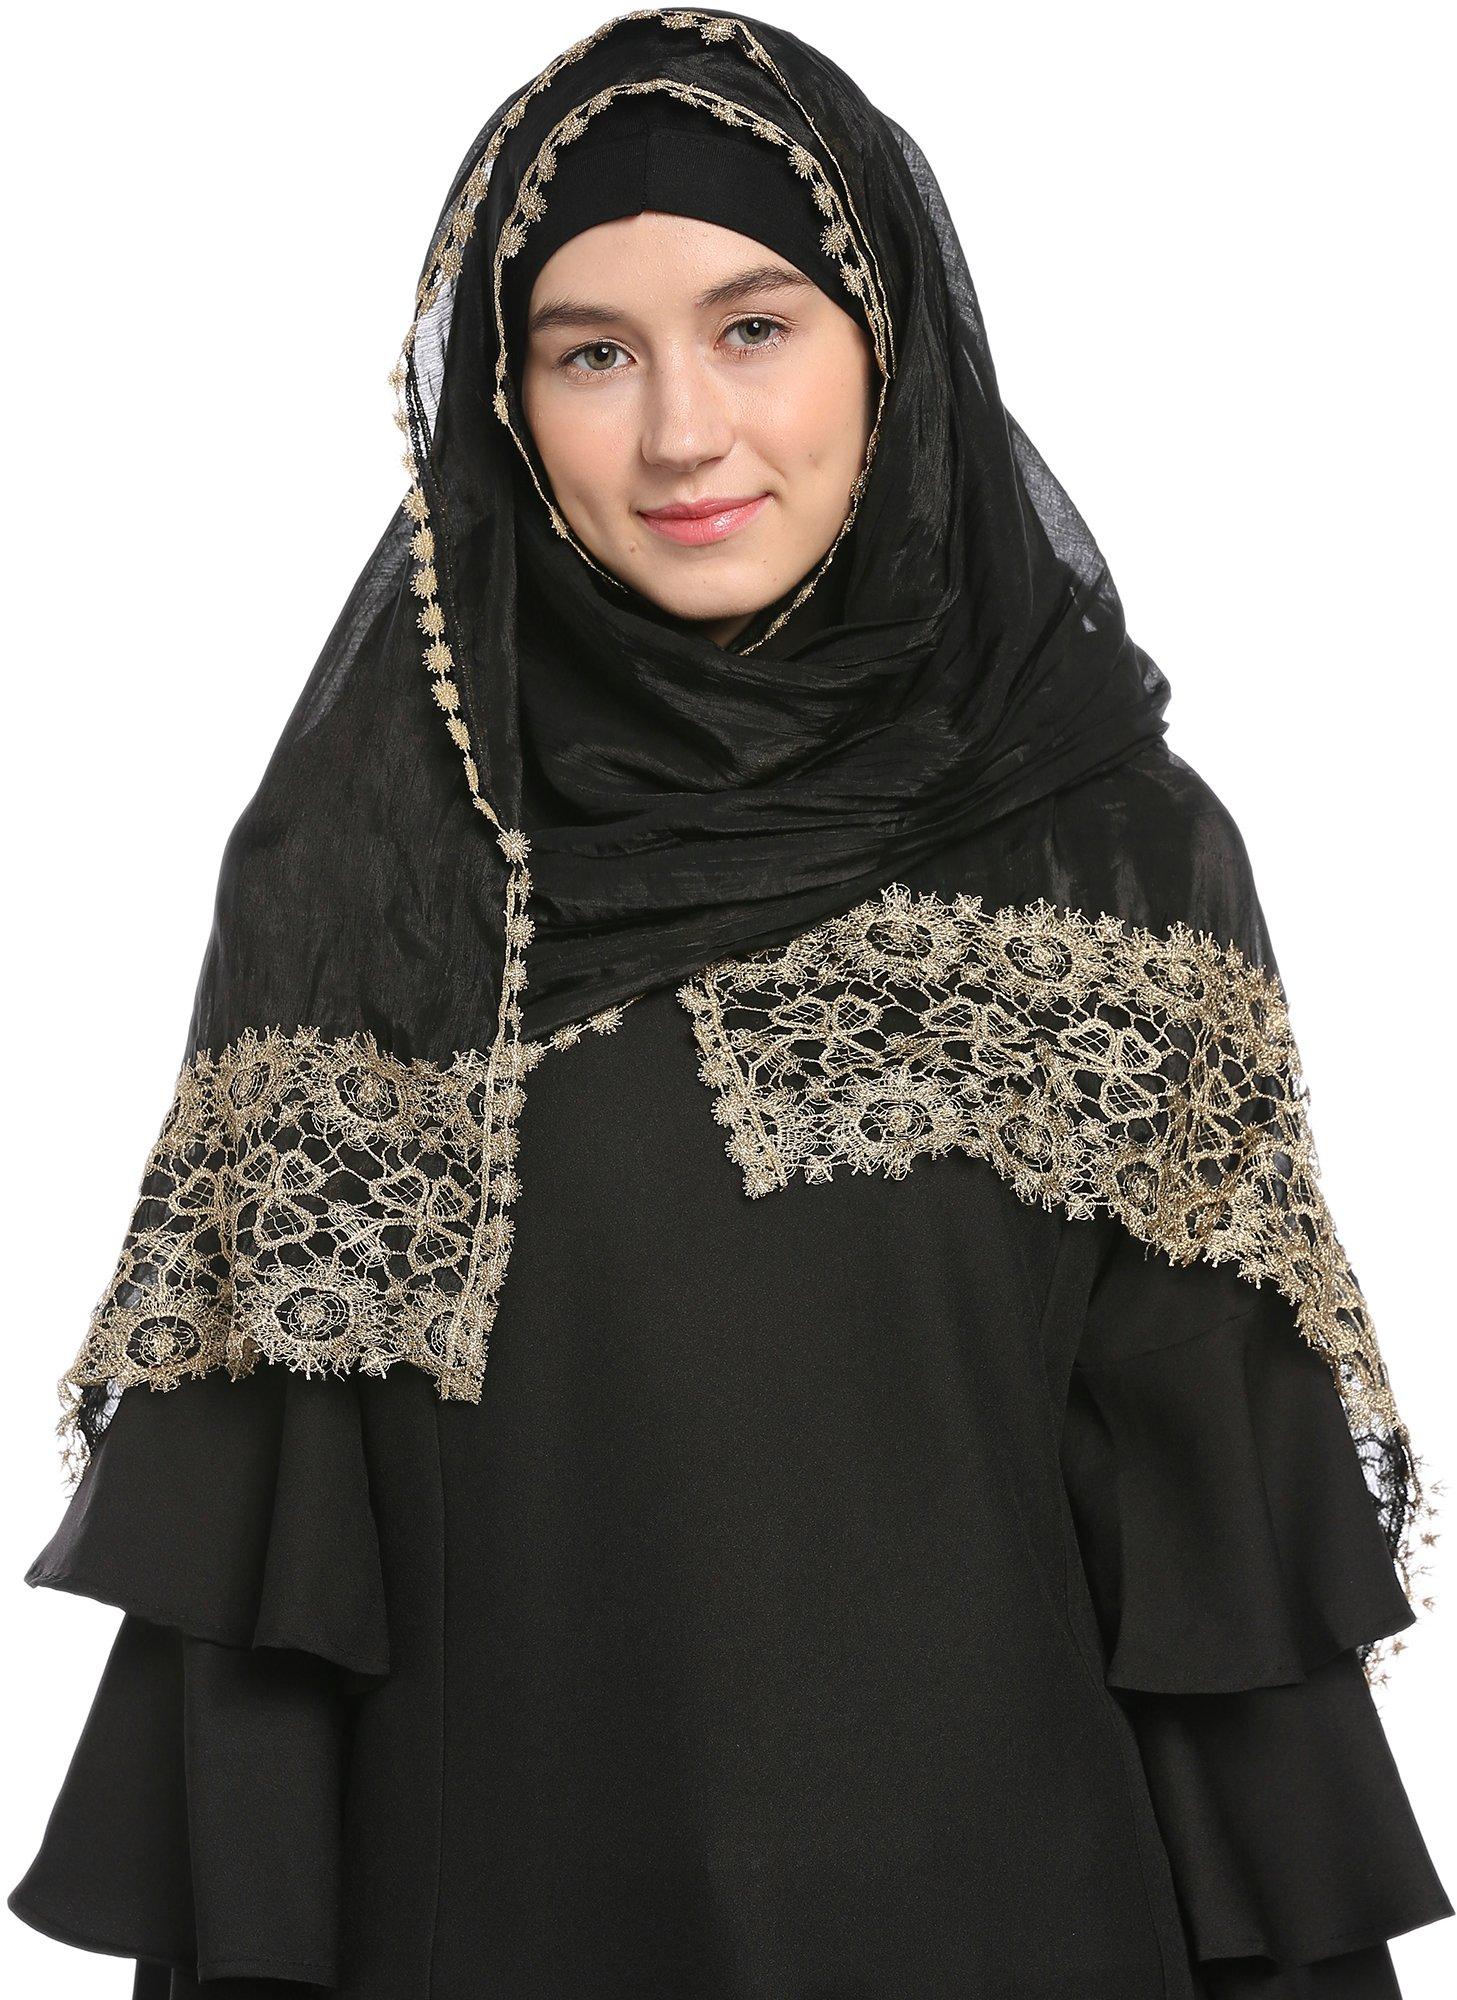 Ababalaya Lace Decorated Wedding Hijab Islamic Hijab, Black